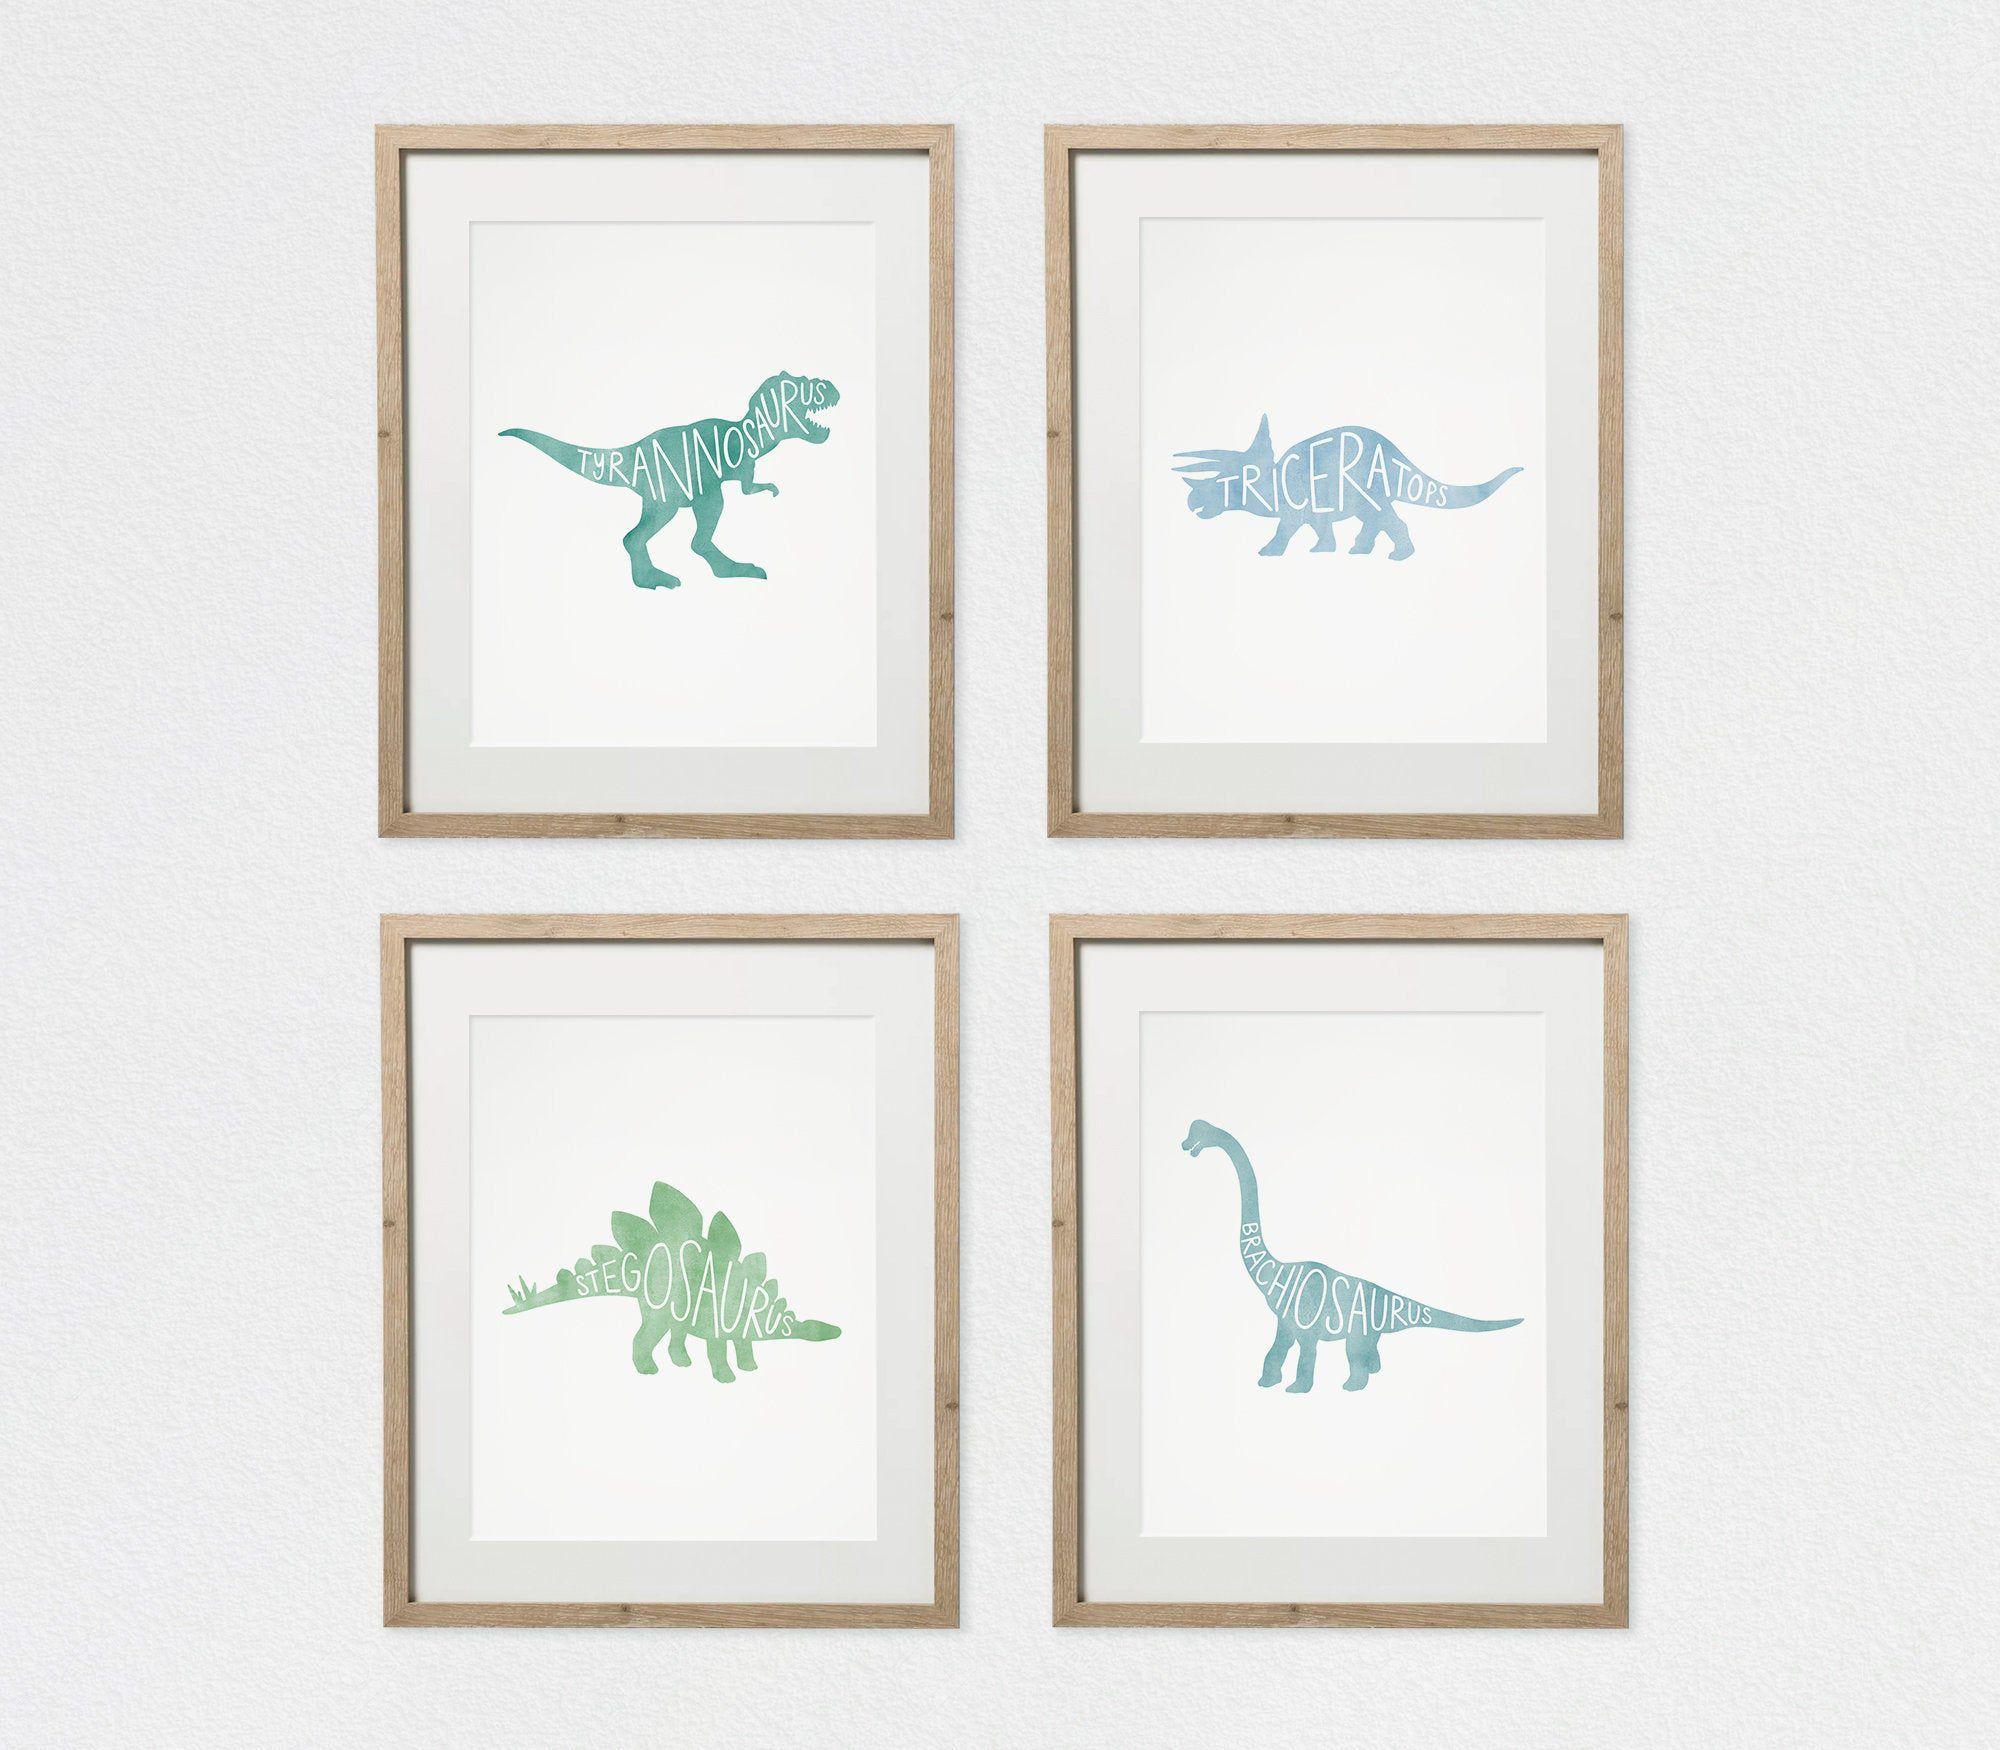 4 Dinosaur Prints Dinosaur Nursery Print Dinosaur Wall Art Dinosaur Art Dinosaur Nursery 4 Dinosaur Prints Dinosaur Nursery Print Dinosaur Wall Art Dinosaur Art Dinosaur...